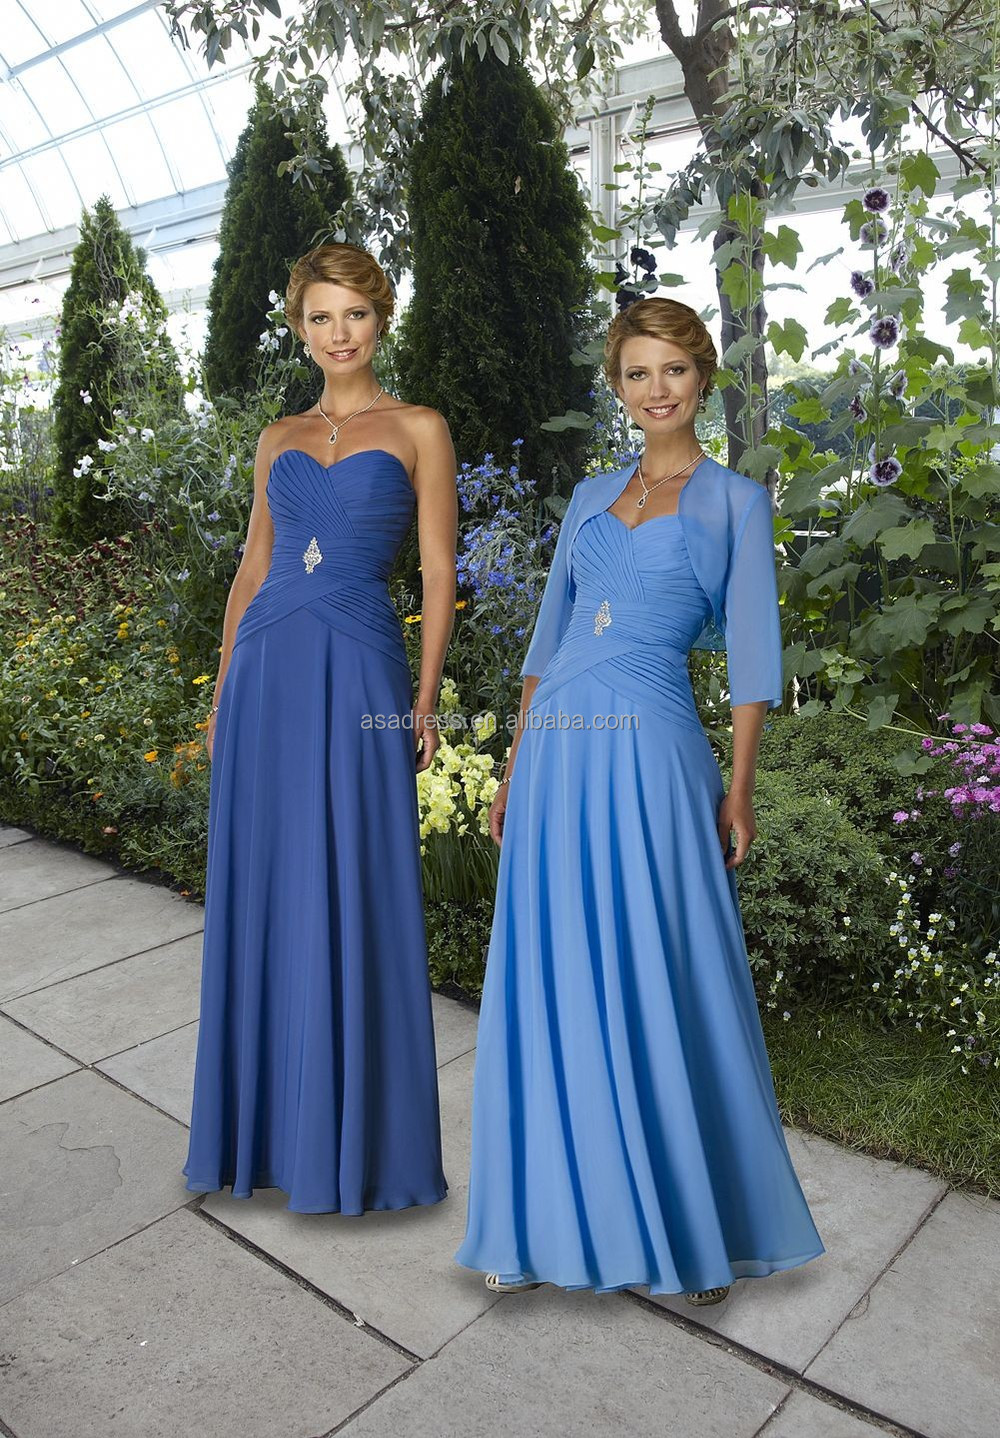 a61d007843 Vintage Satin Organza Cap Sleeve Knee-length suit Mother Of The Bride Dress  2015(